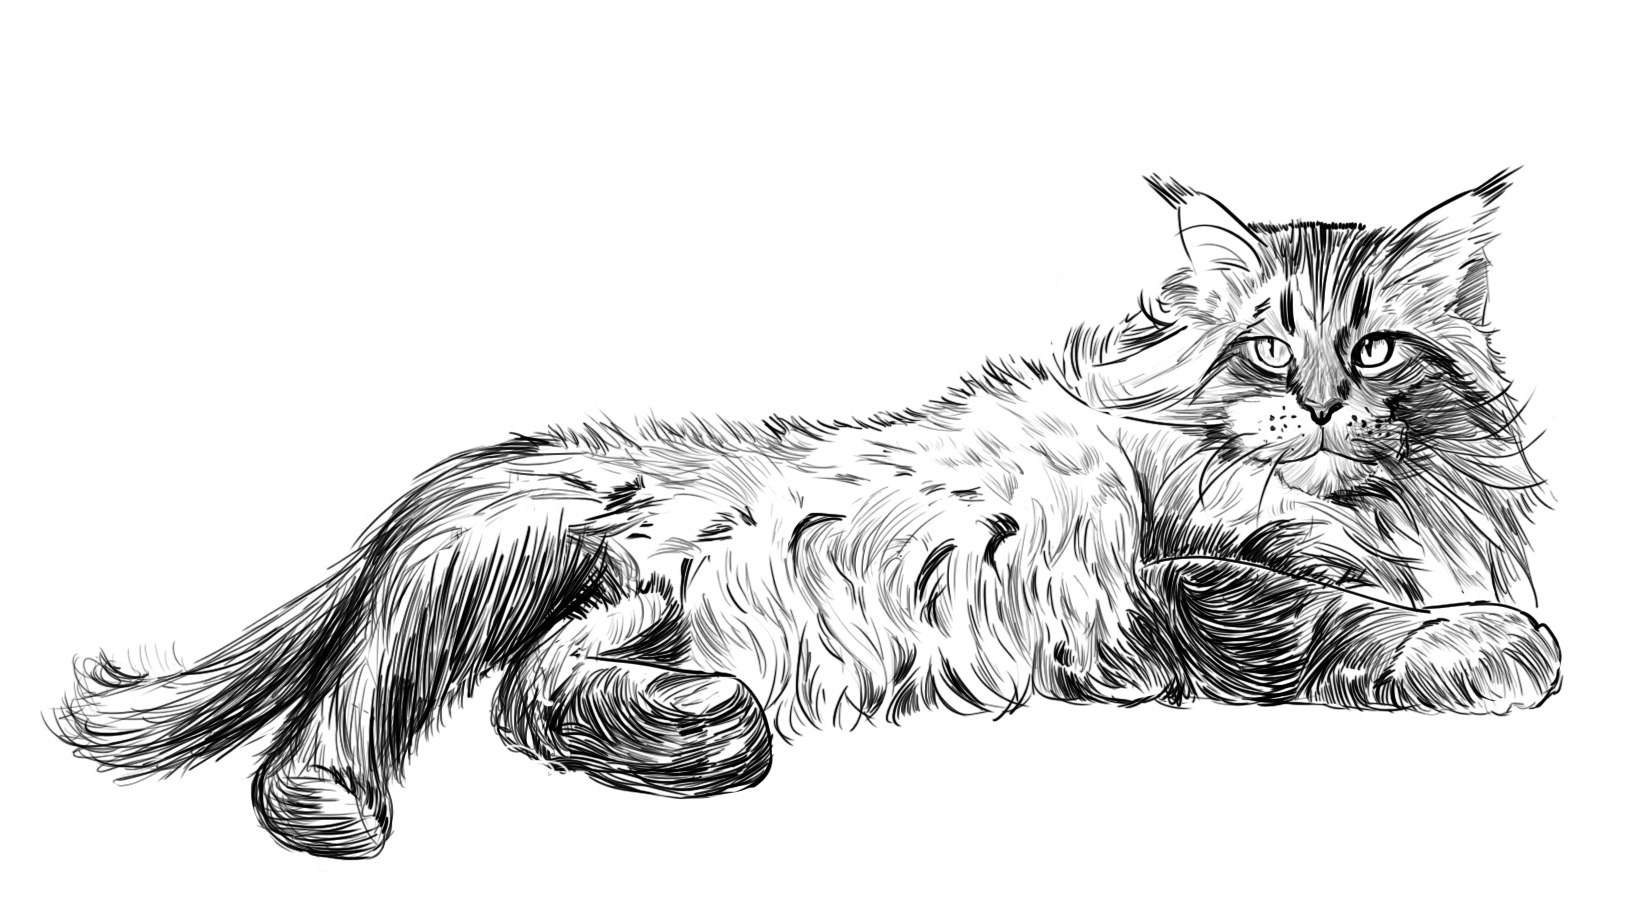 Рисунок кота для визитки